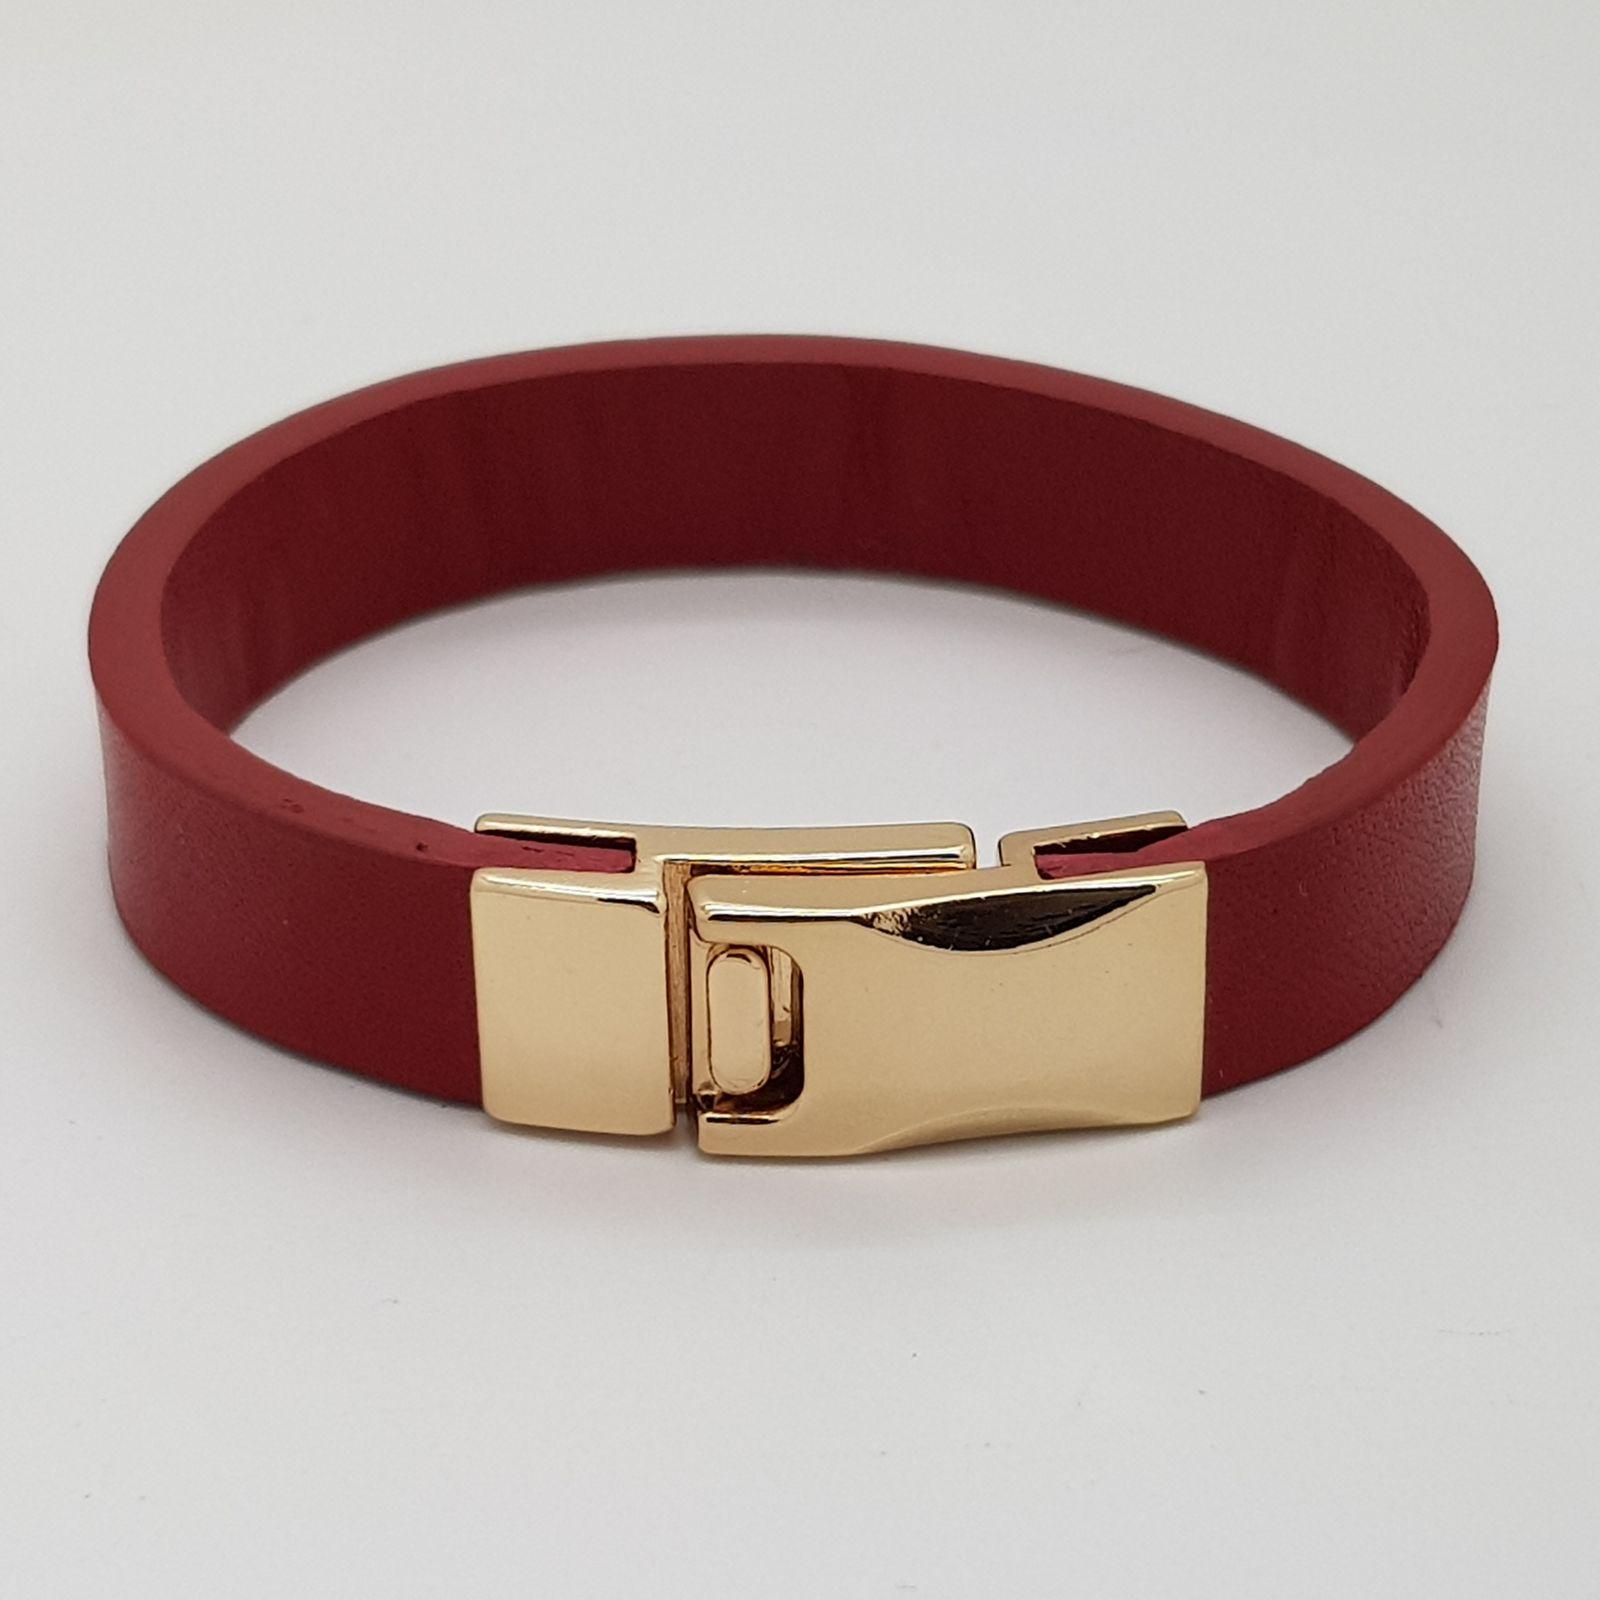 دستبند کد ۱۲۰ thumb 2 4